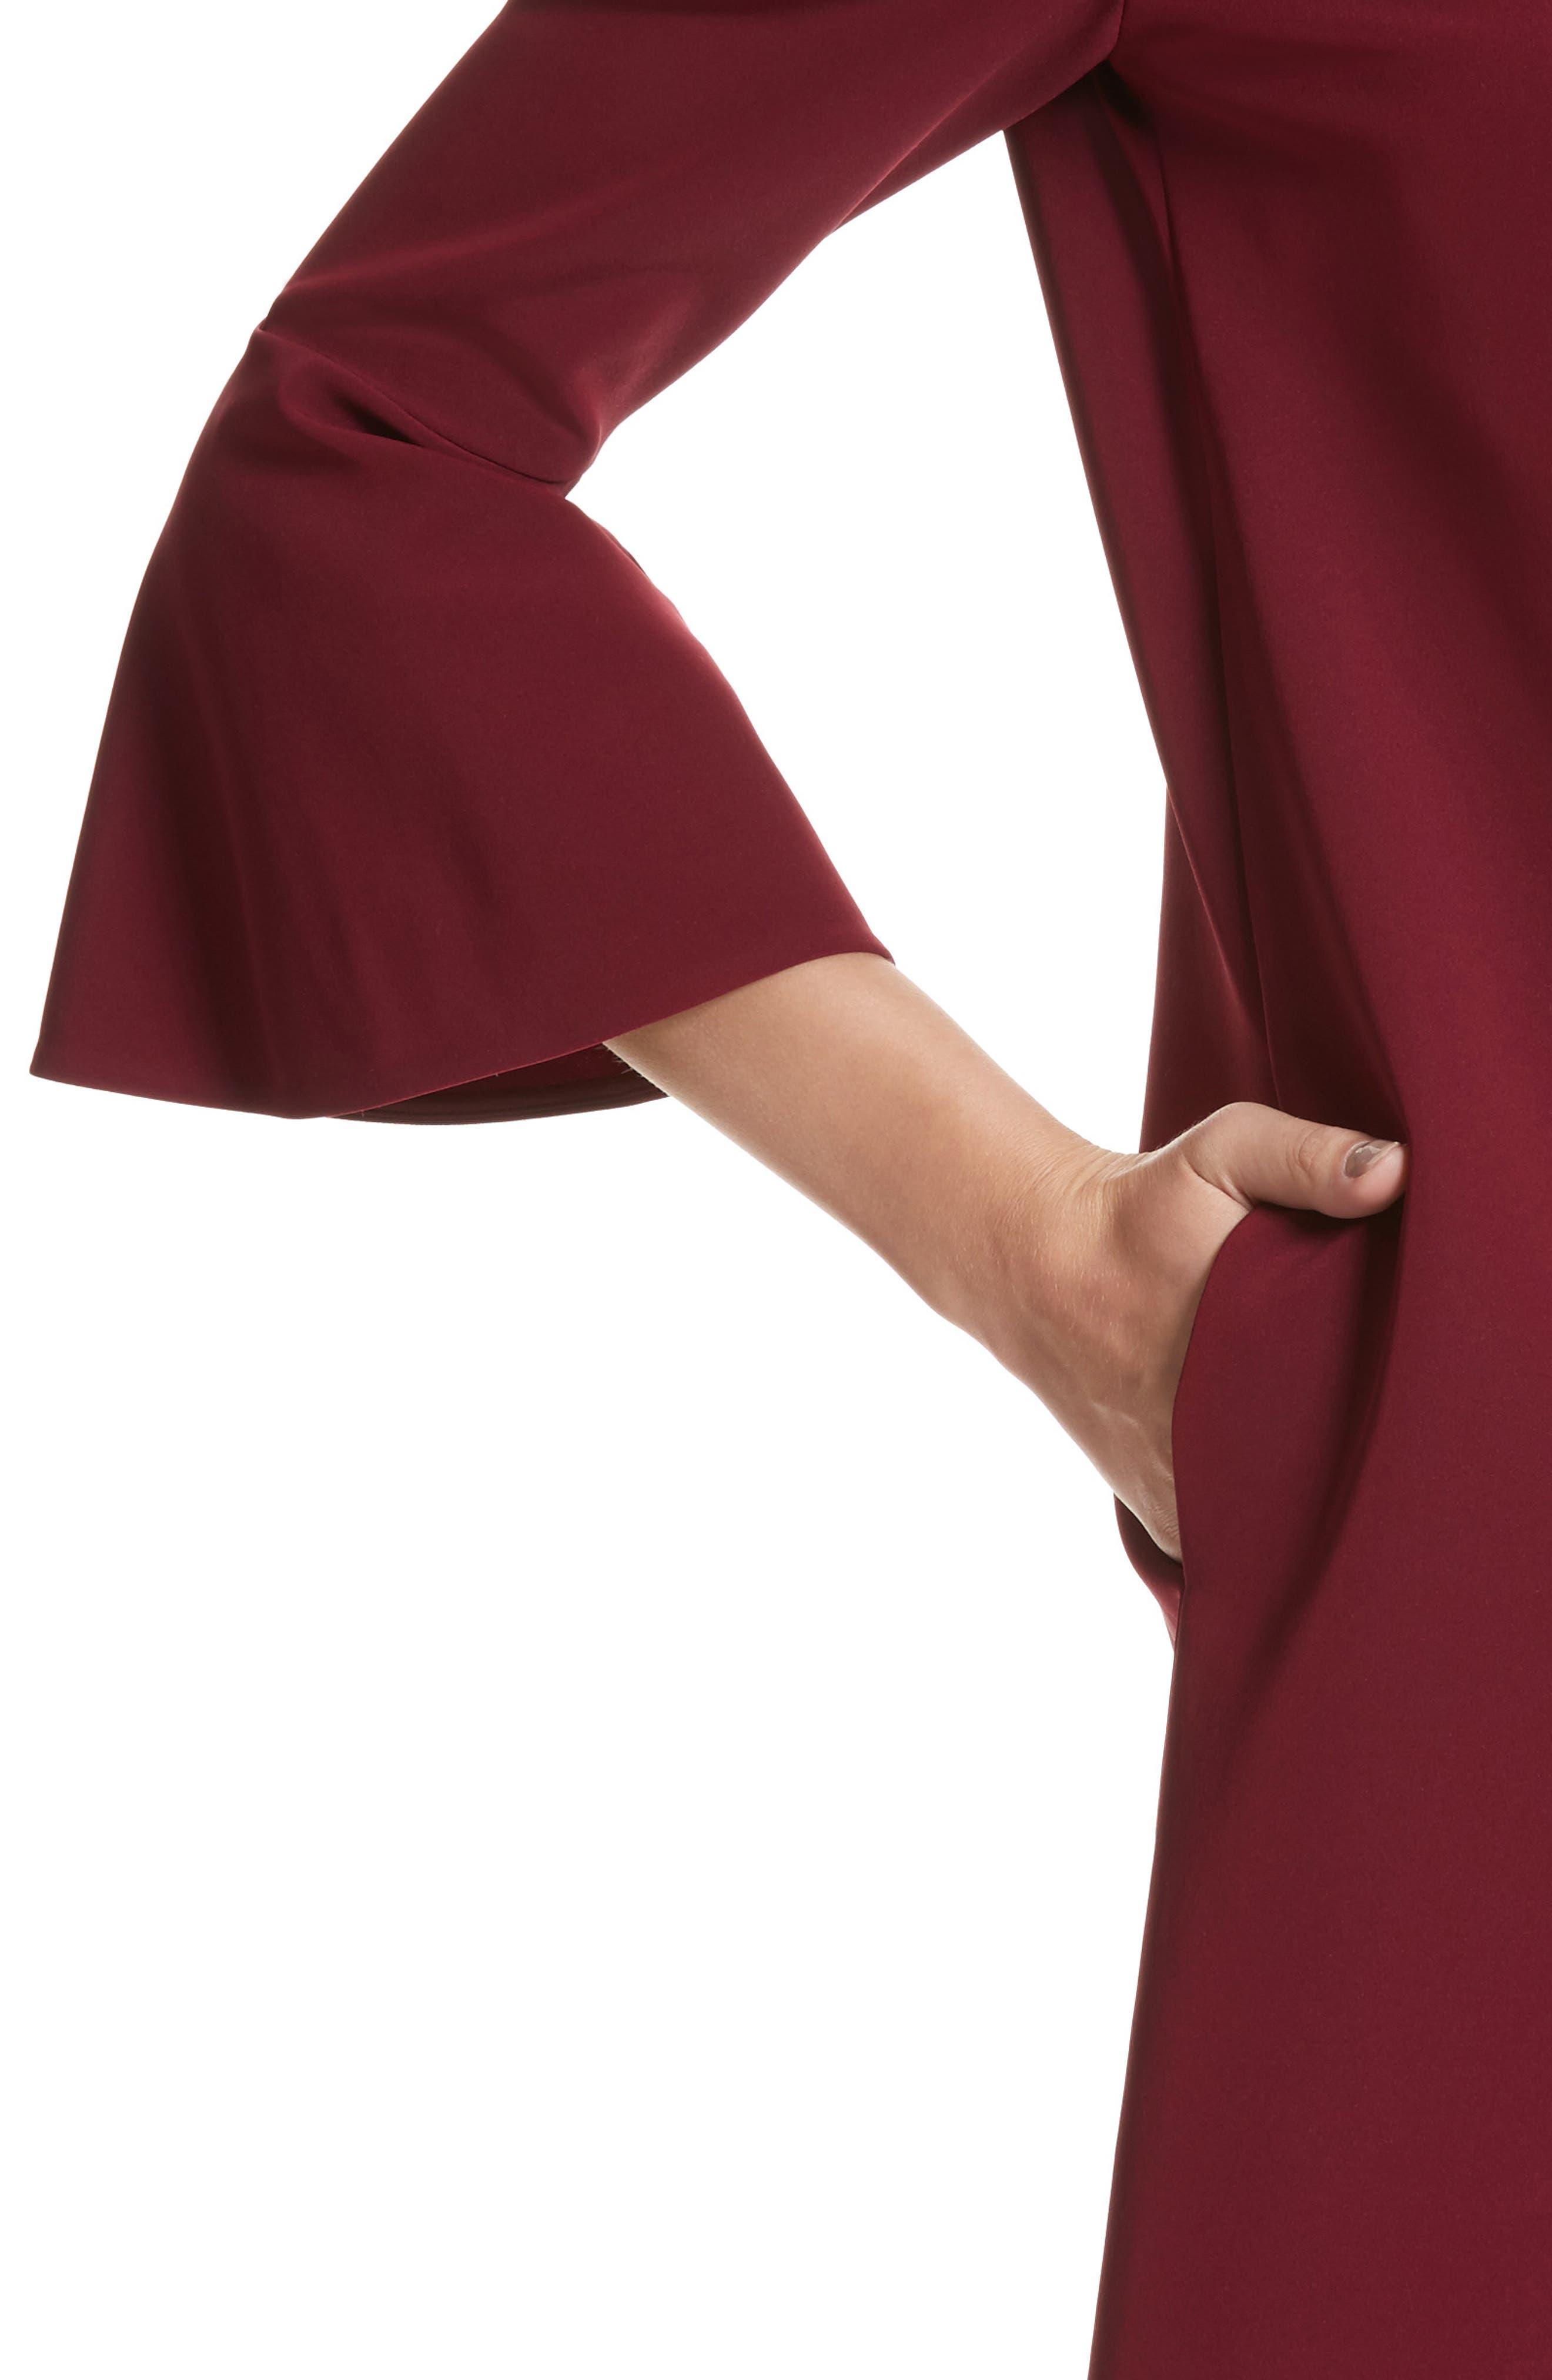 Sidra Emory Cloth Dress,                             Alternate thumbnail 4, color,                             930